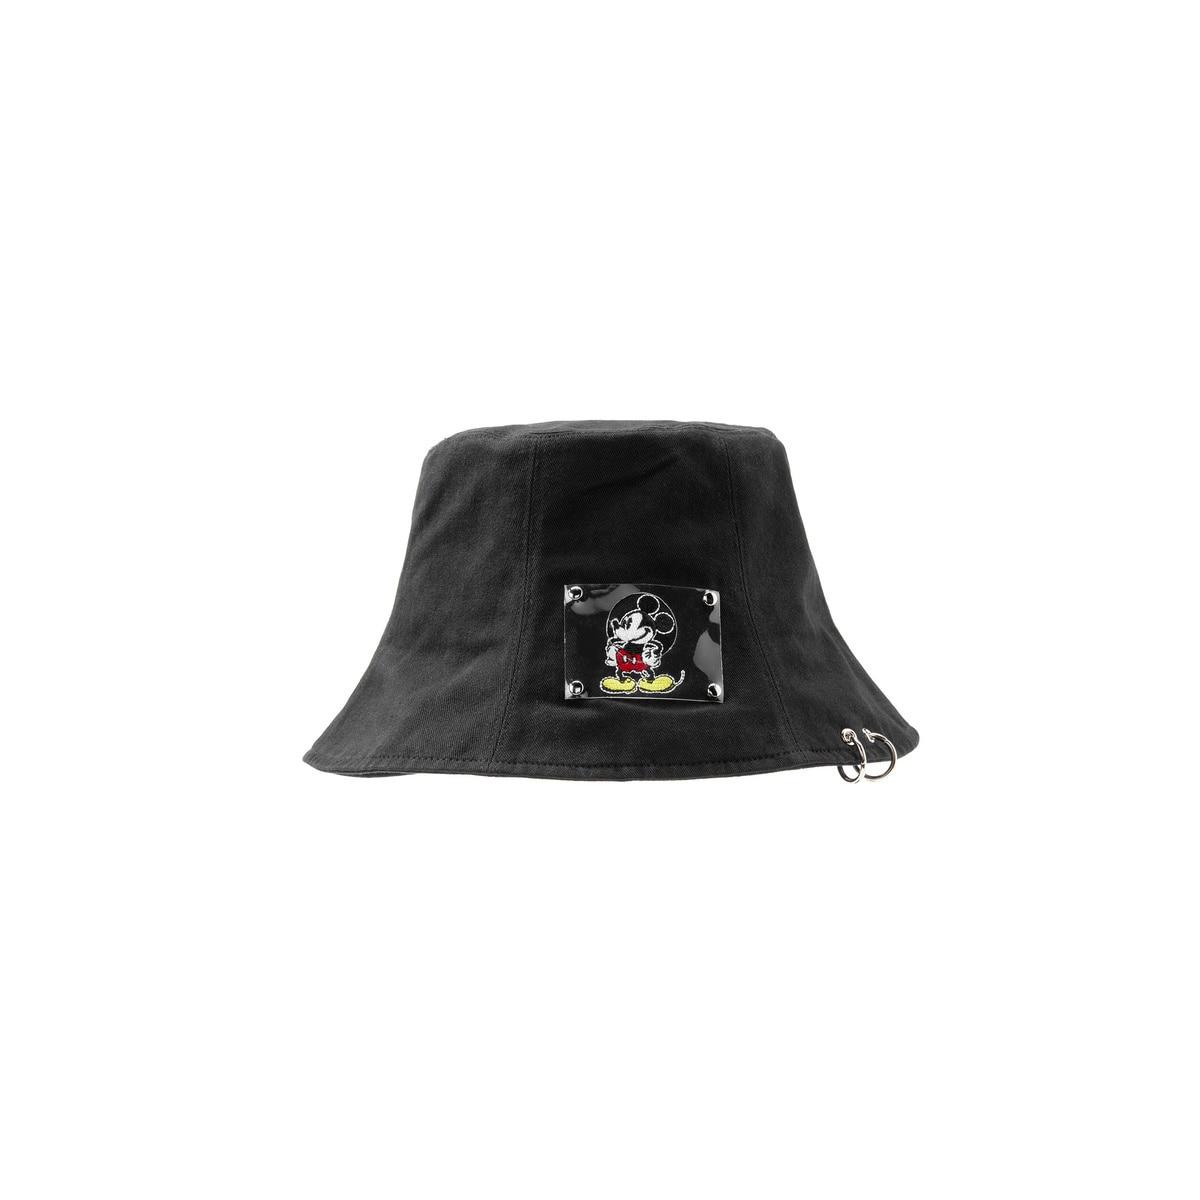 Disney Mickey Mouse Women Hats Women's Casual Sunshade Korean-Style Bucket Hat Cotton Women Hats Sun Protection Caps for Ladies 1